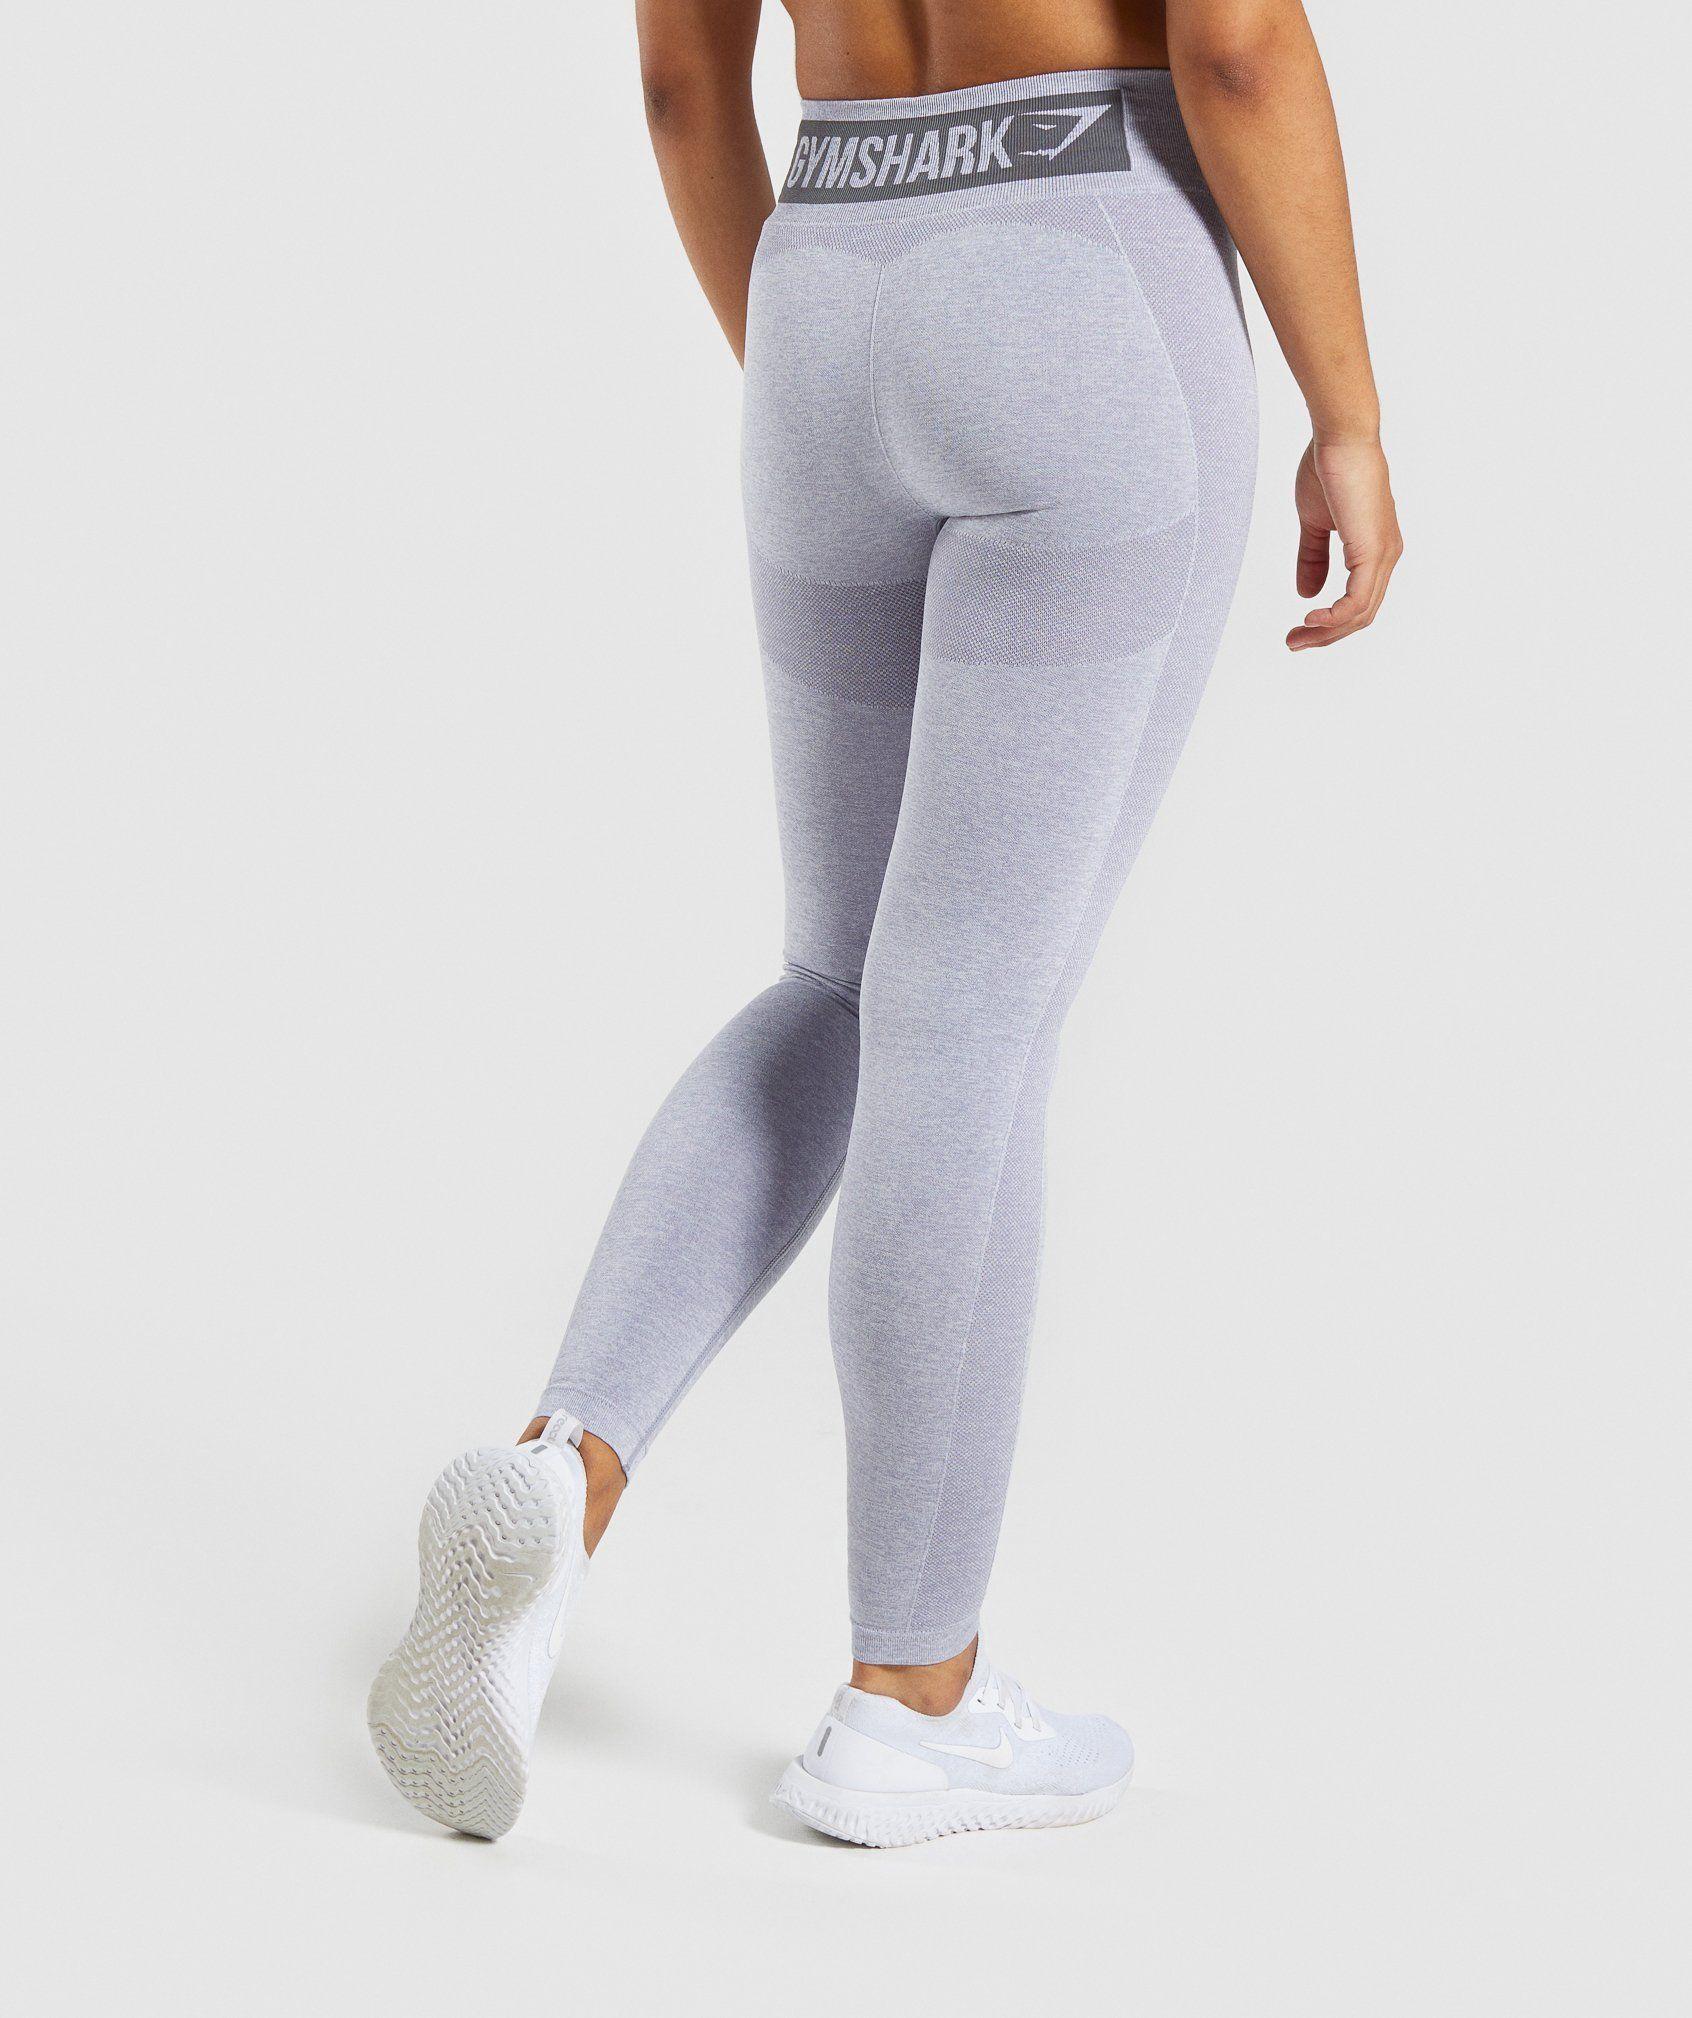 f845be384d7 Gymshark Flex High Waisted Leggings - Black Charcoal in 2019 ...